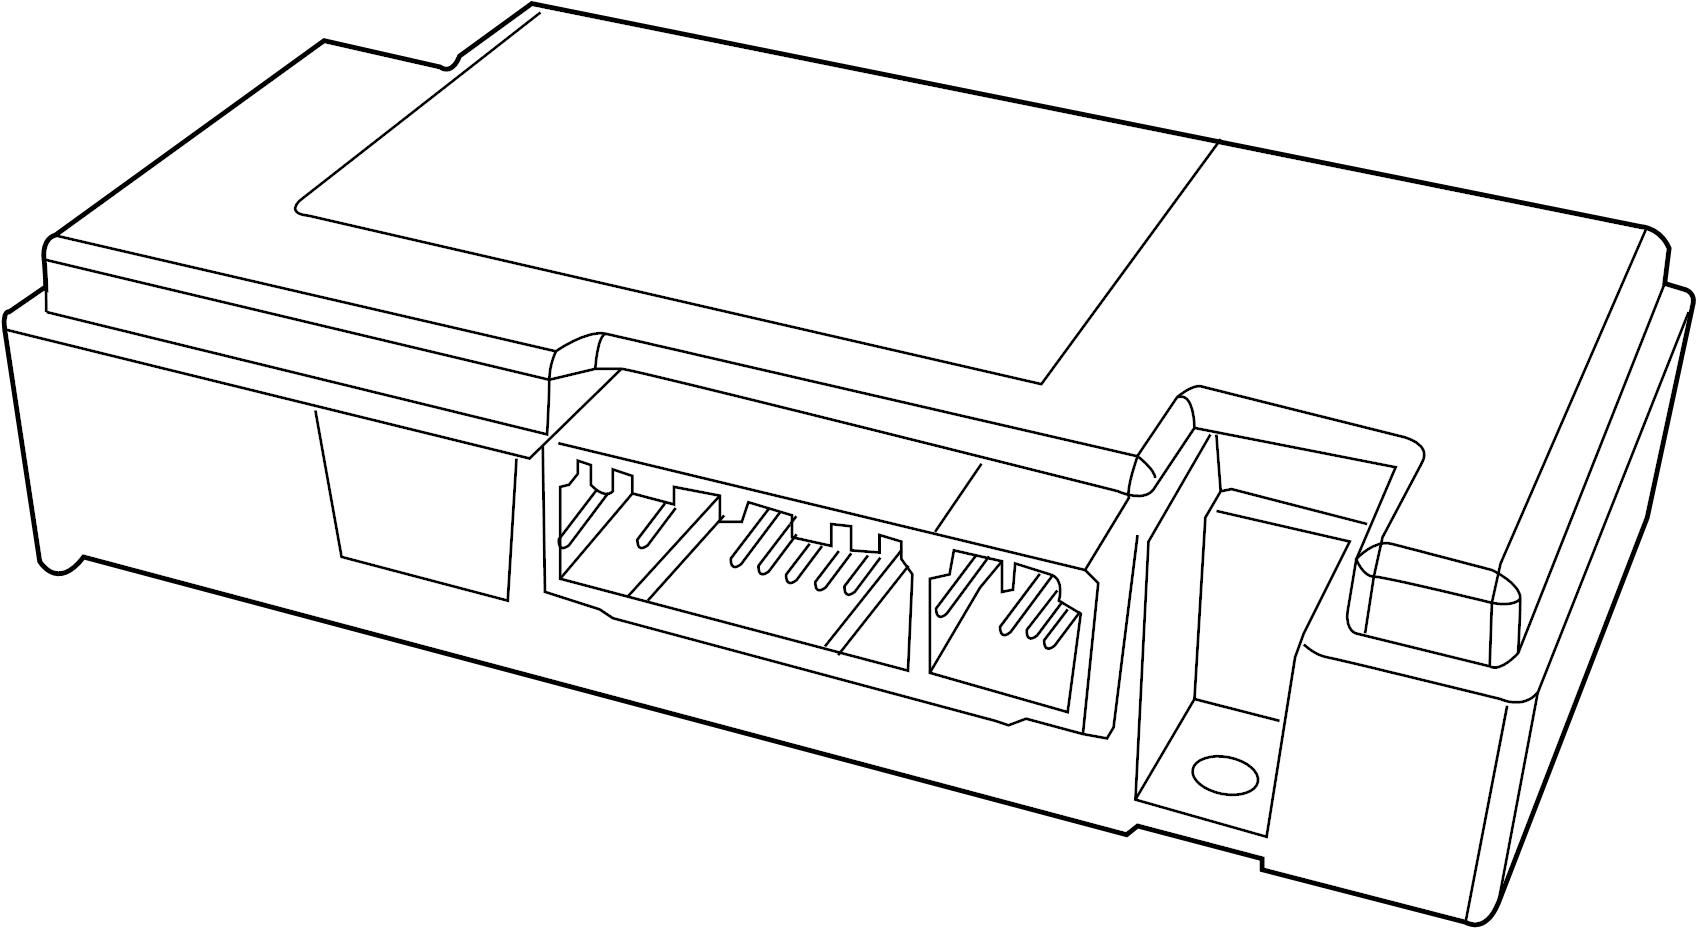 Module Telematics Modules Instrument Panel Modules Instrument Panel Made By Chrysler